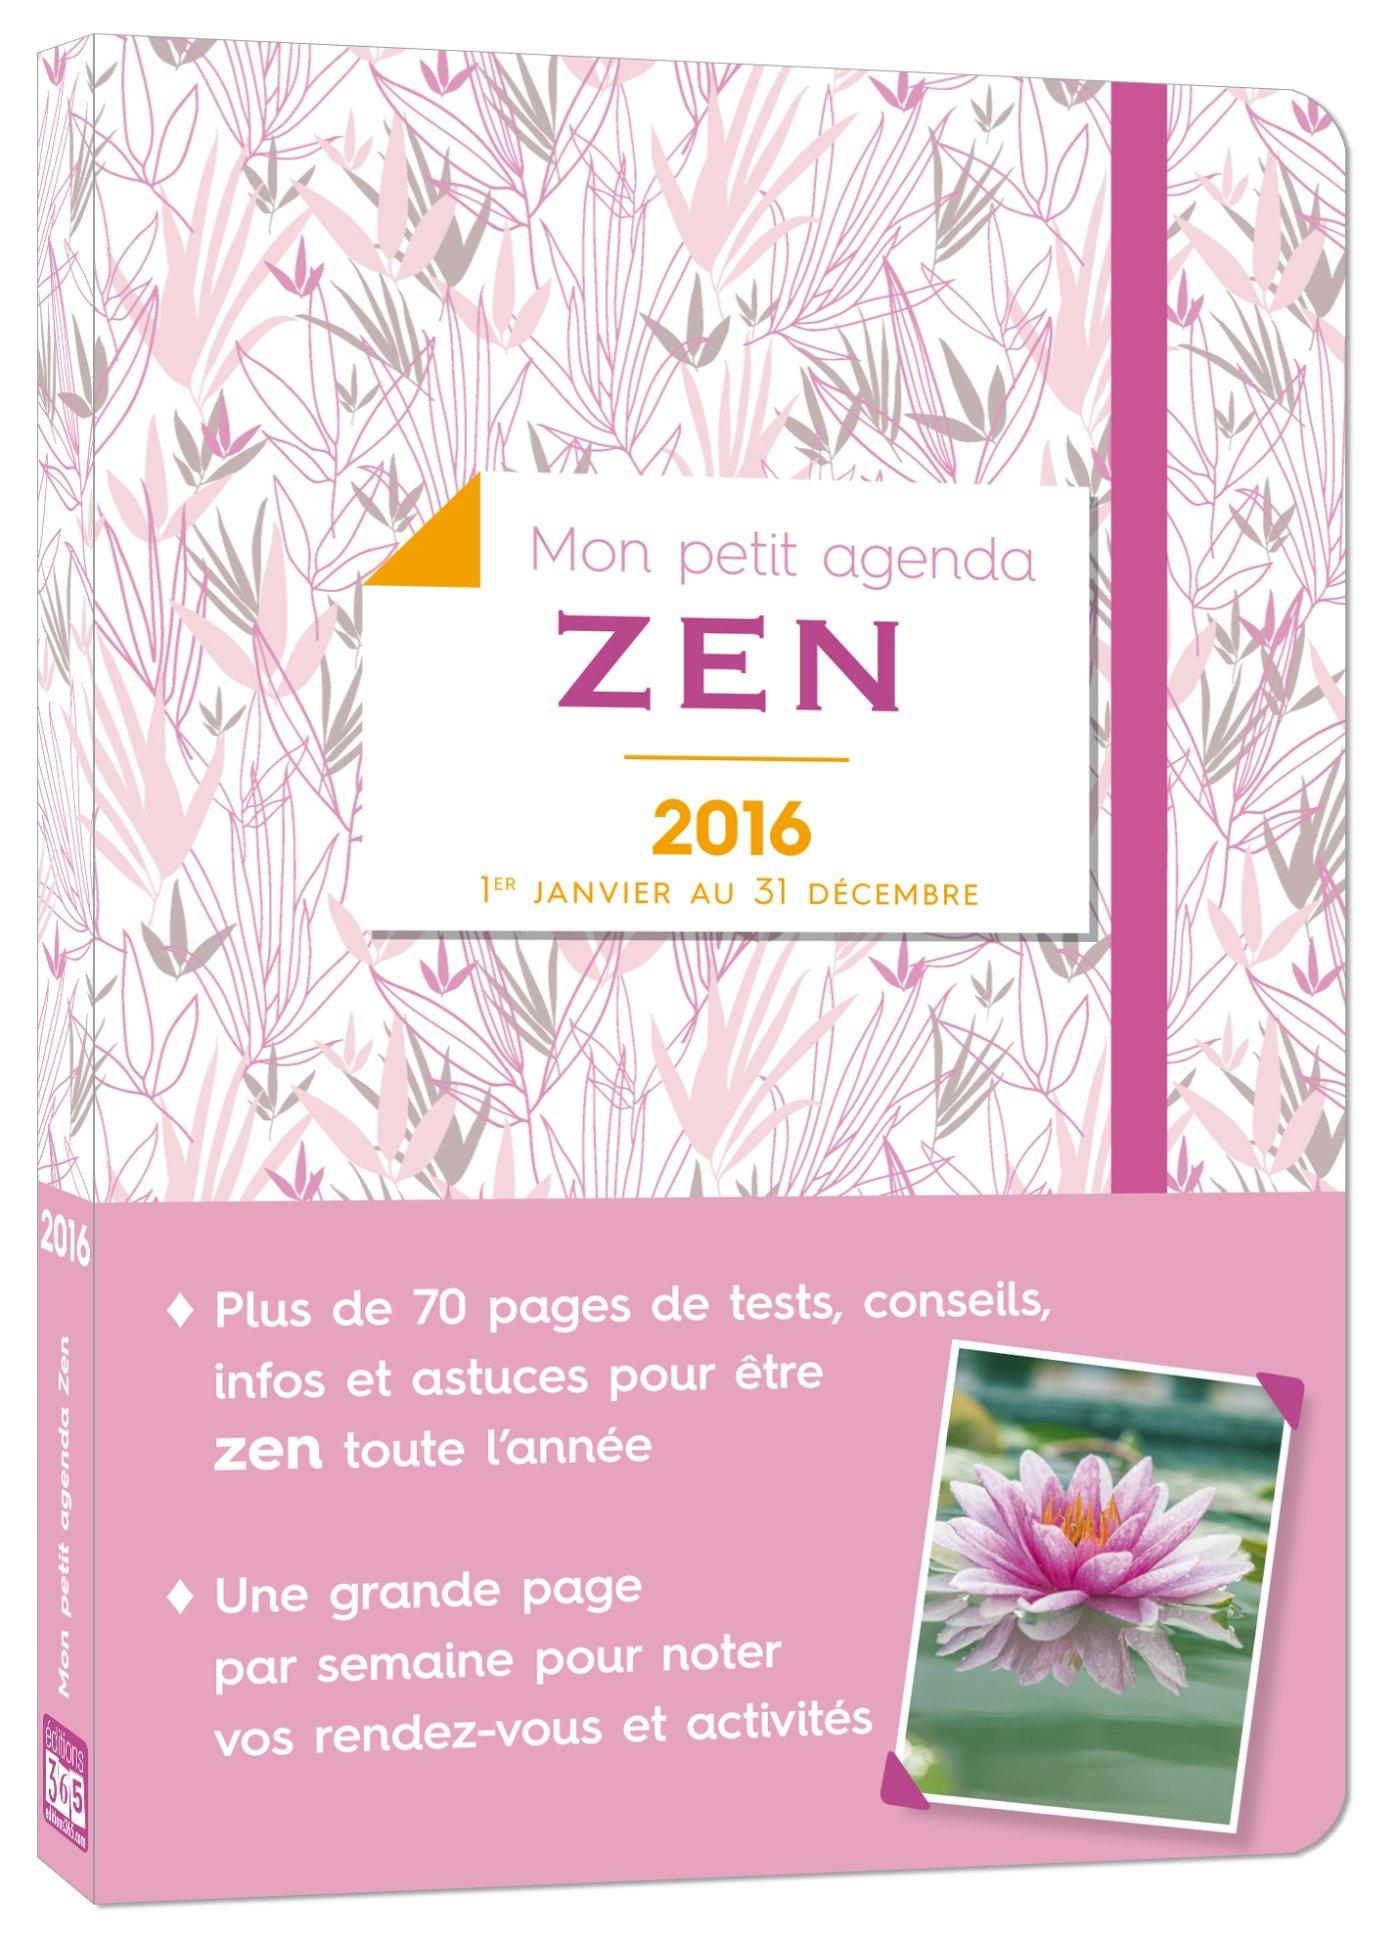 Mon petit agenda Zen 2016: 9782351556702: Amazon.com: Books